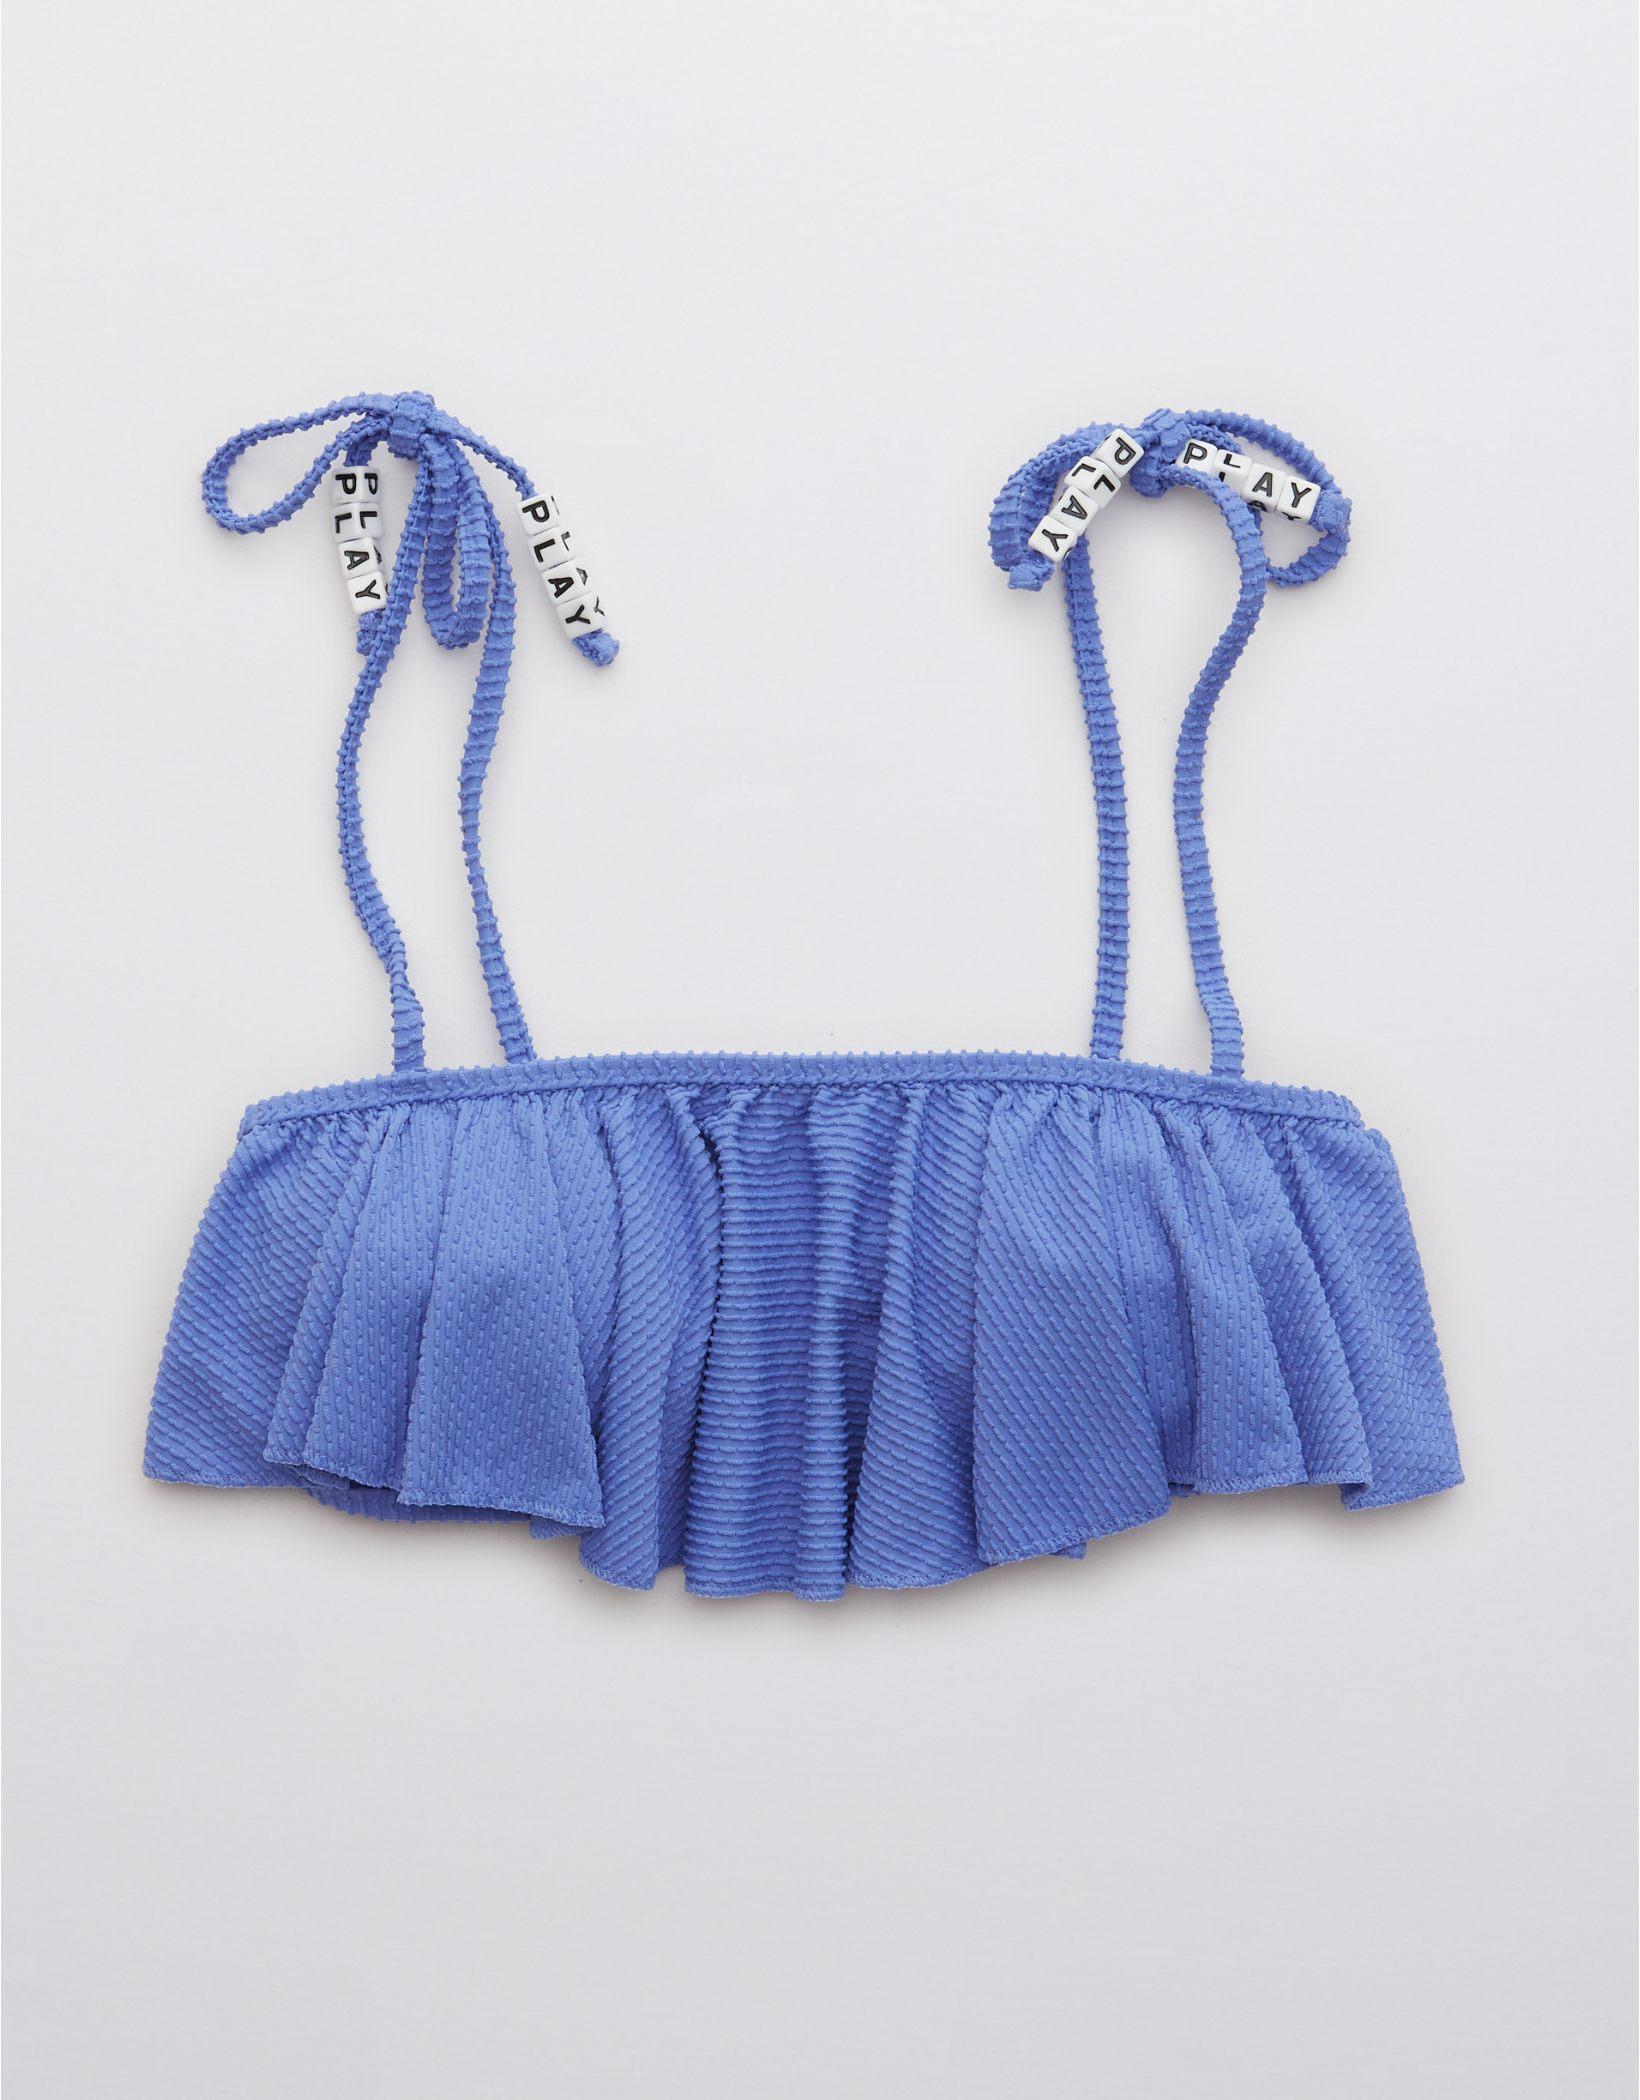 Aerie Textured Ruffle Bandeau Bikini Top